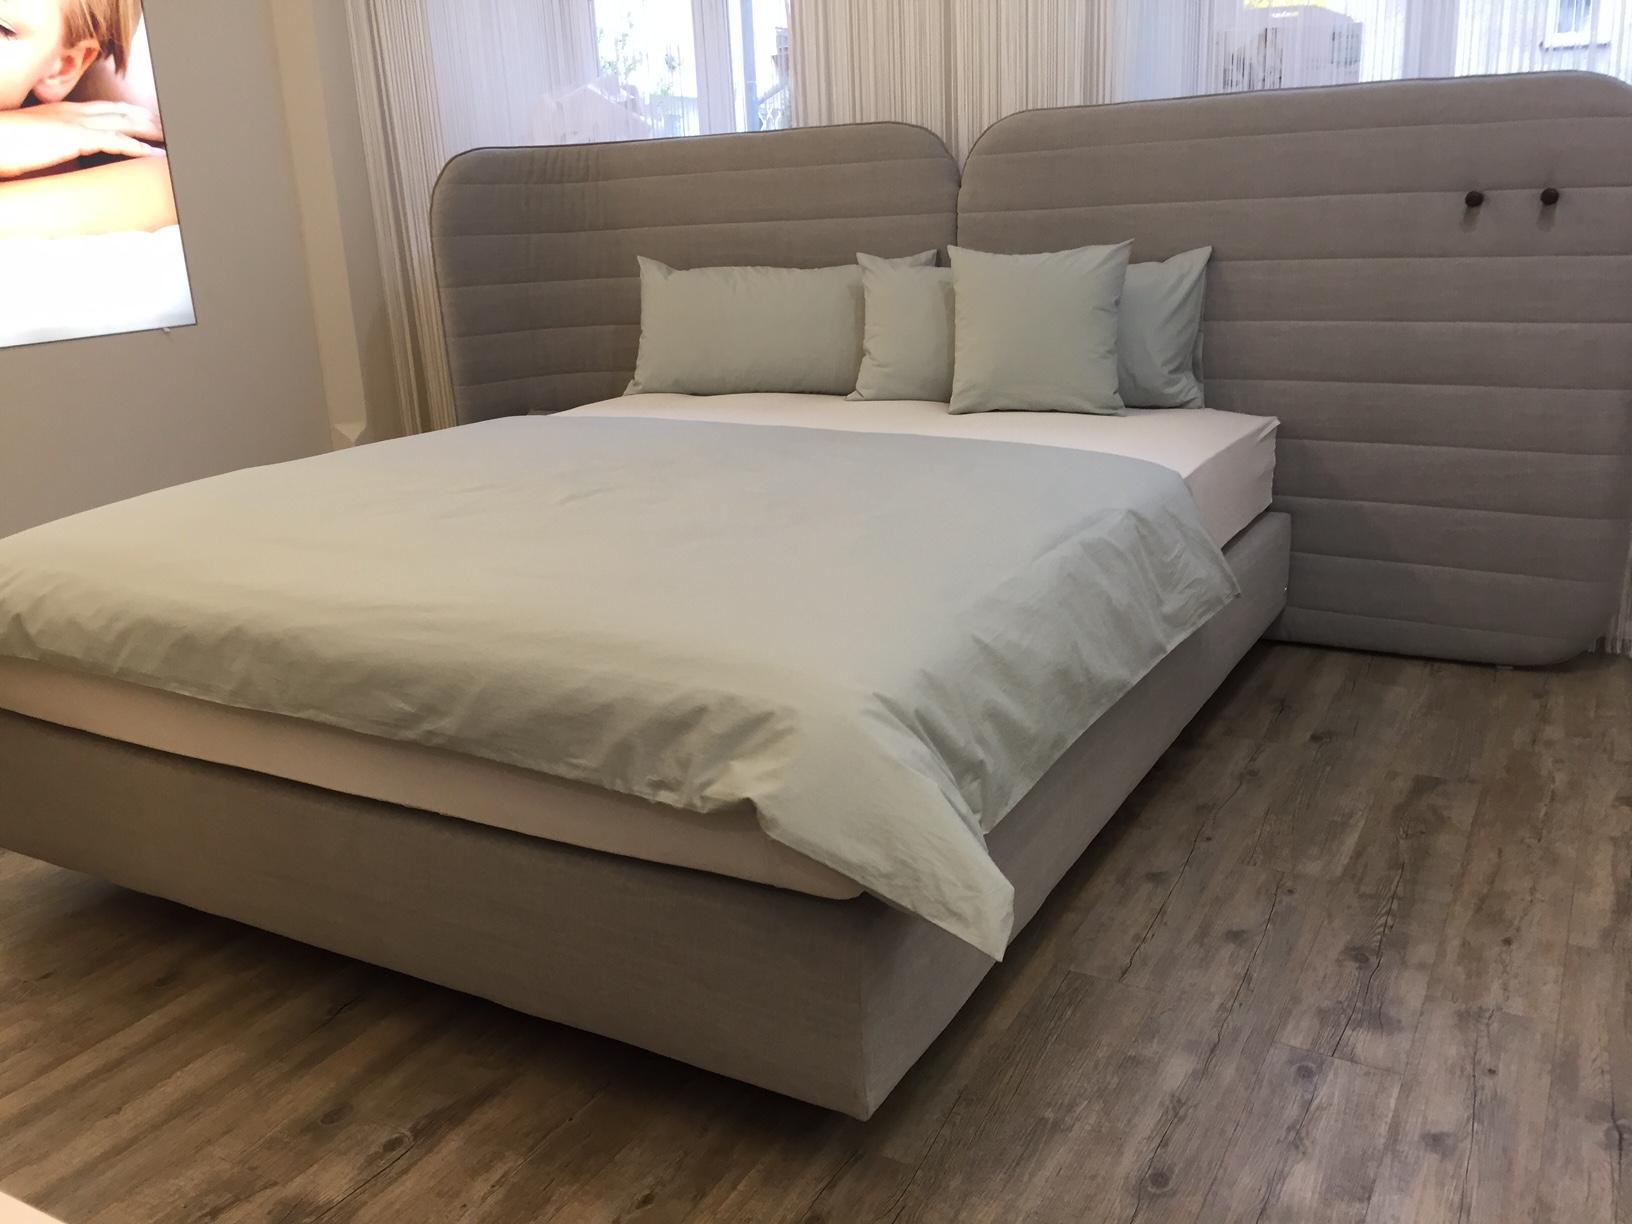 schramm purebed calm betten klobeck. Black Bedroom Furniture Sets. Home Design Ideas